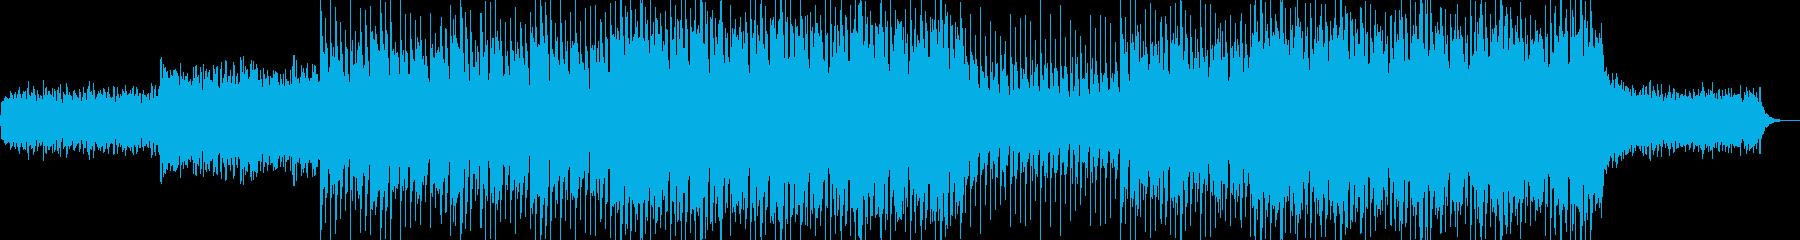 EDMポップで明るいクラブ系-41の再生済みの波形